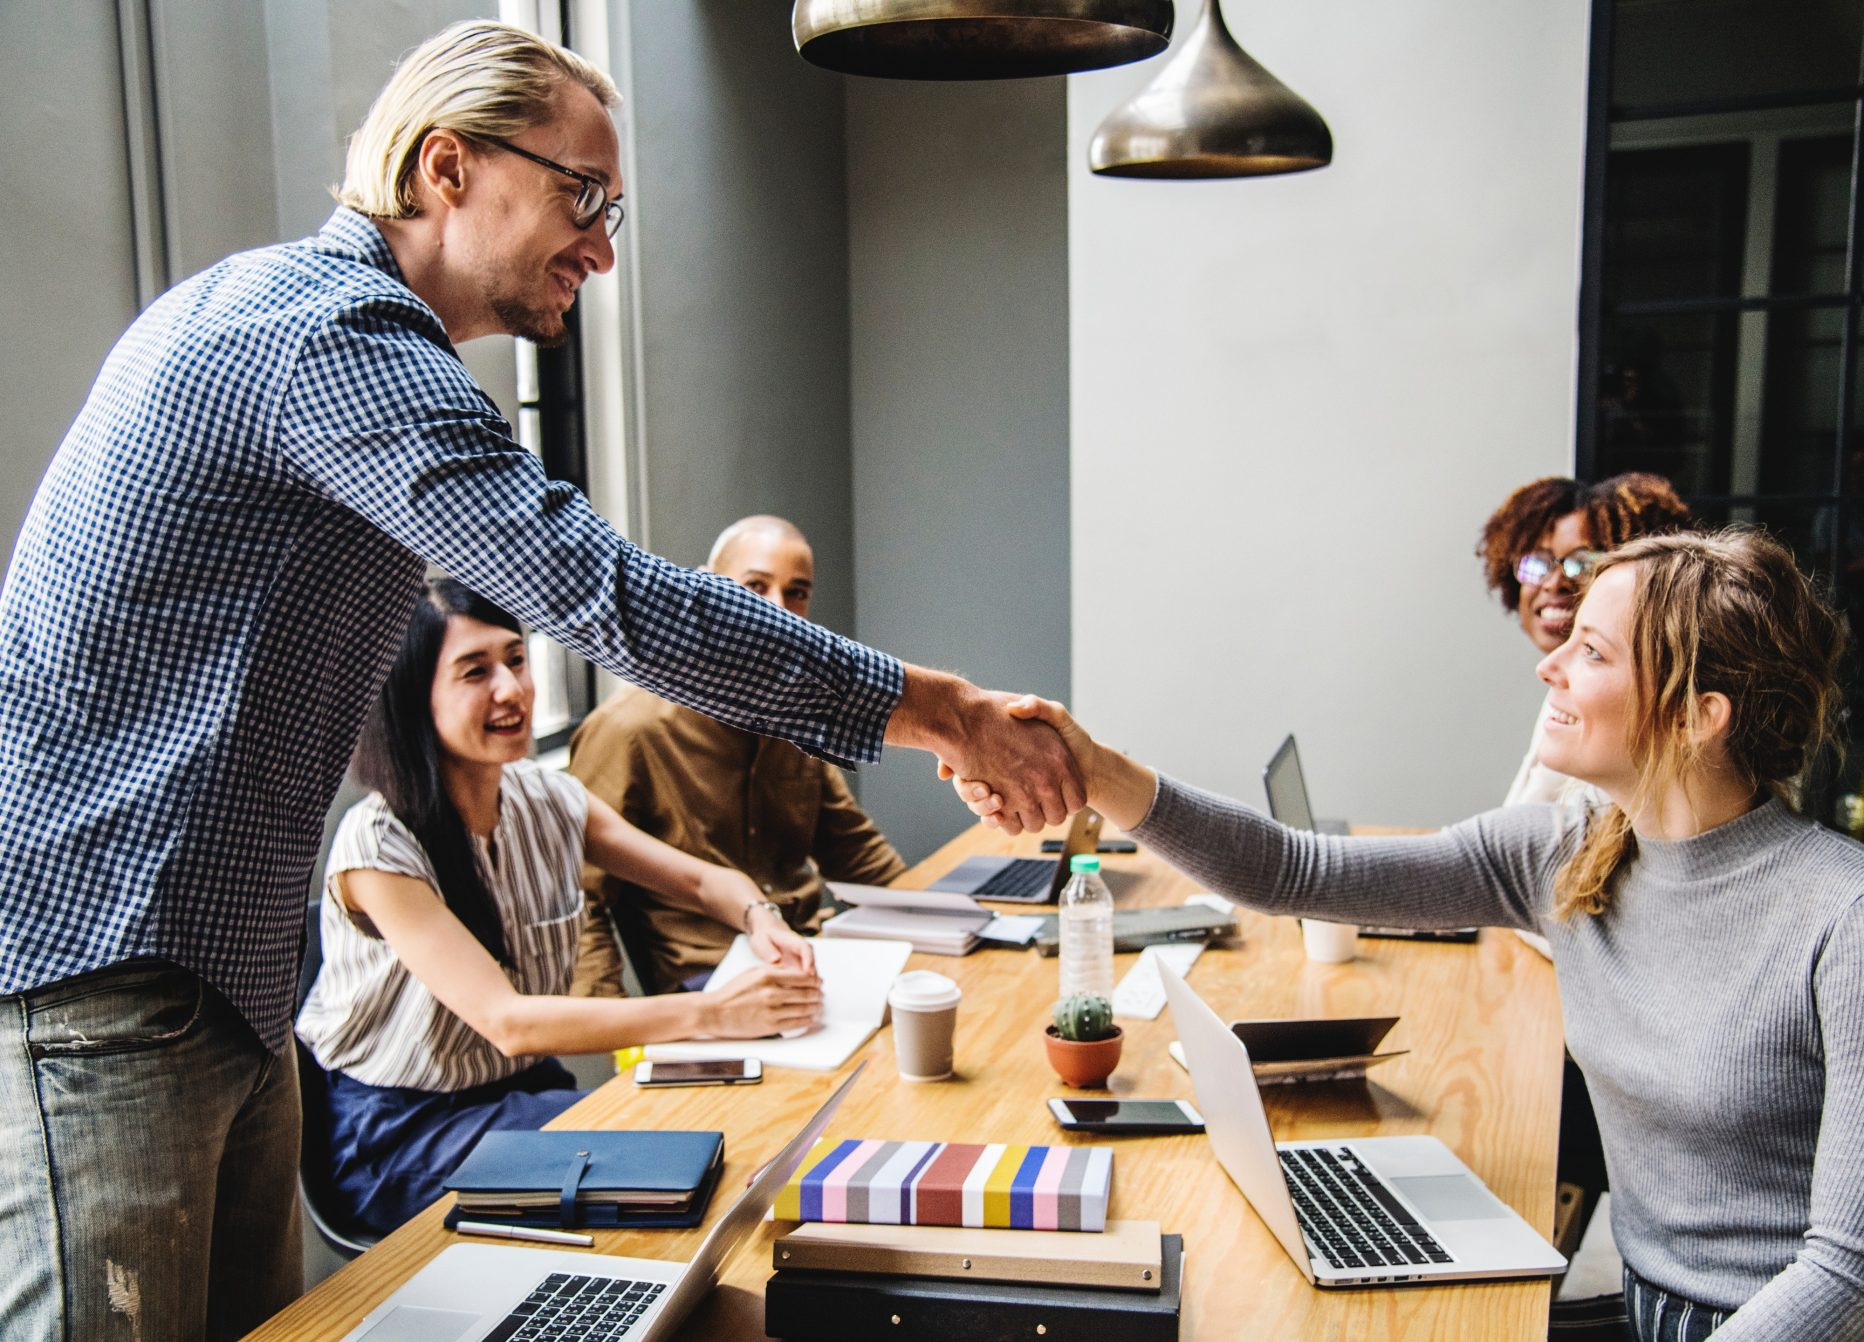 IDEIS-ideis-management-cabinet-formation-formations-conseil-consulting-coaching-accompagnement-communication-rennes-paris-organisme-certifie-certifié-qualite-qualité-apprendre-se-former-distance-digital-manager-managers-équipe-equipe-equipes-team-humain-ressources-humaines-ressource-capital-mbti-pcm-inventaire-de-personnalite-process-communication-vente-negociation-négociation-relation-client-stratégie-manager-développement-personnel-collectif-individuel